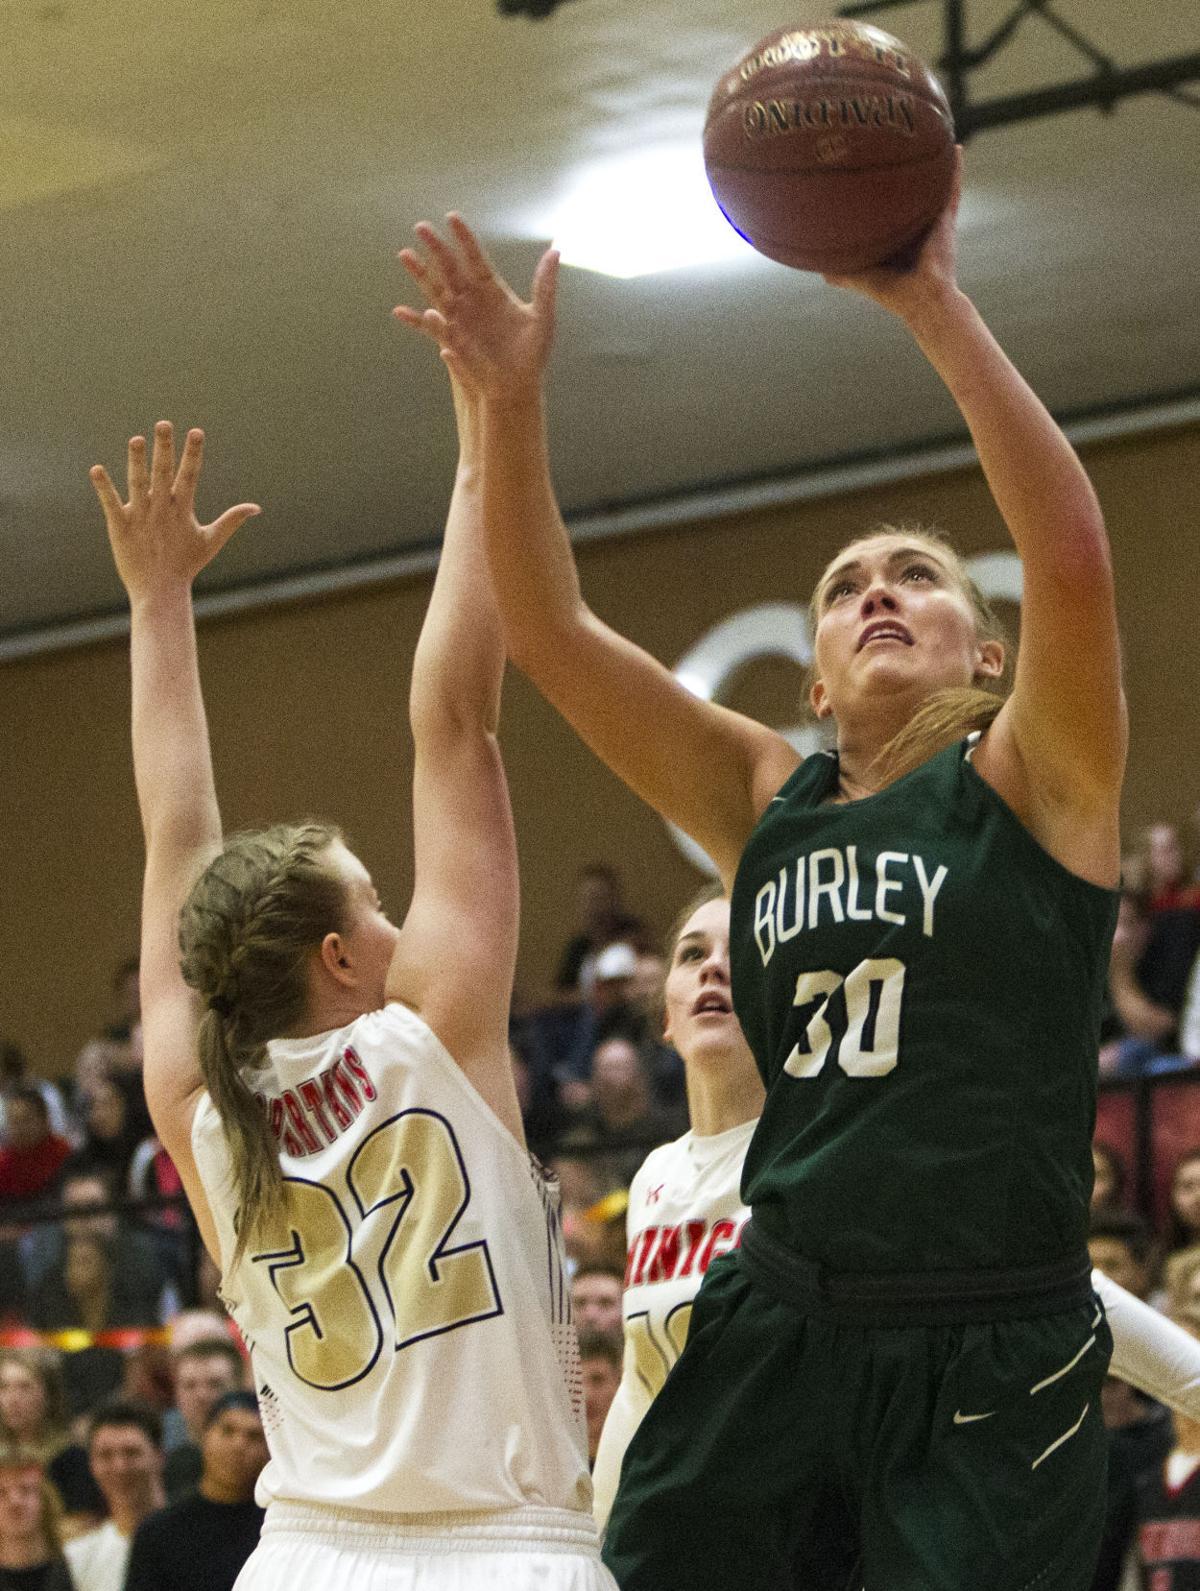 Minico vs. Burley girls basketball